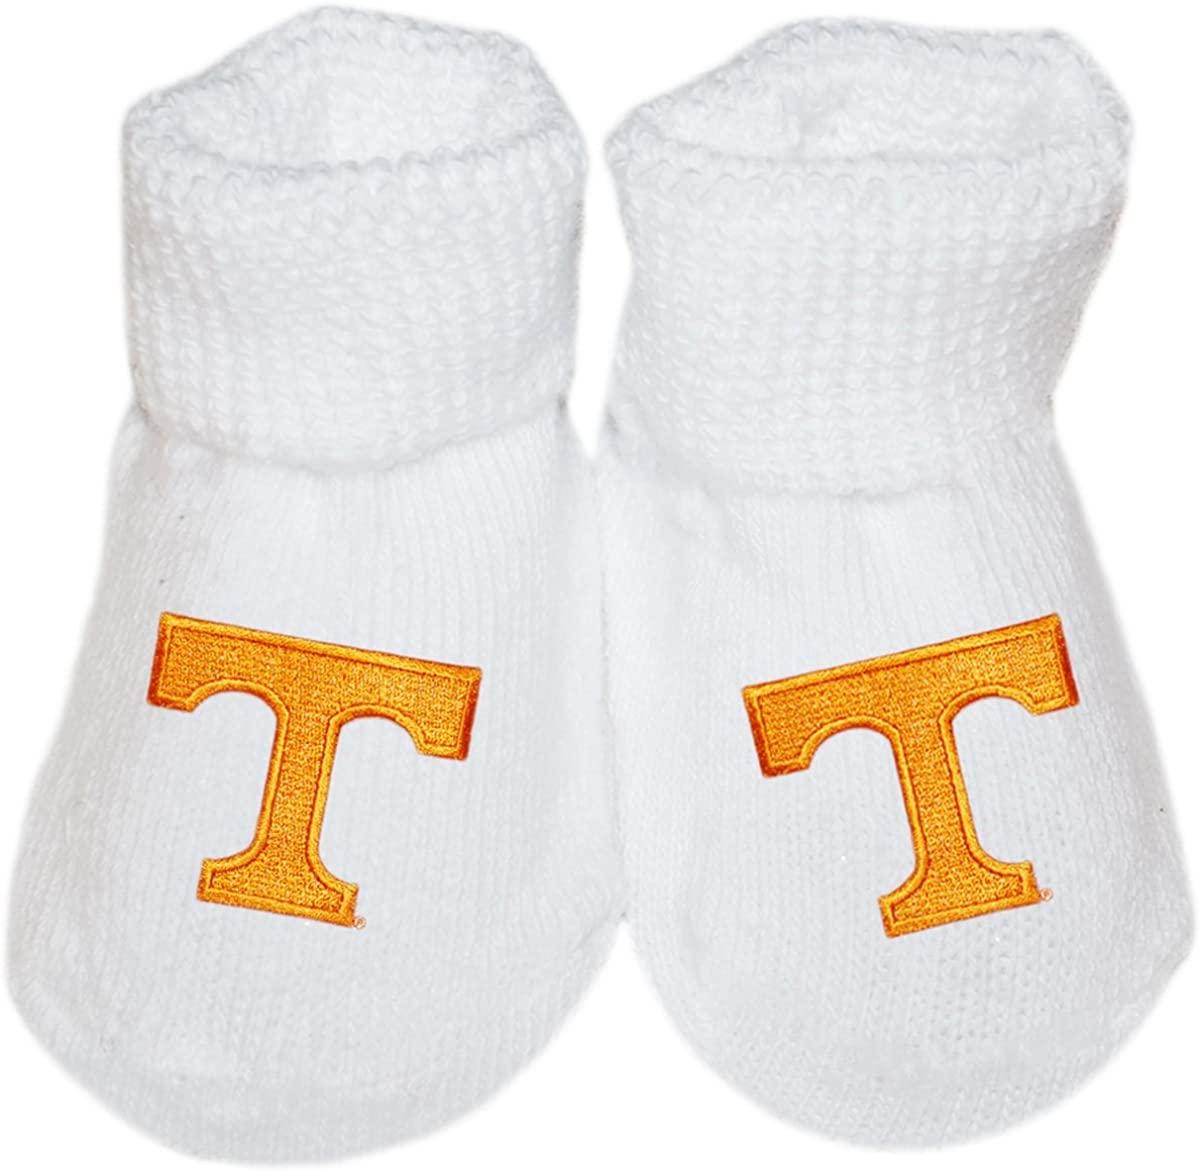 University of Tennessee Vols Newborn Baby Bootie Sock